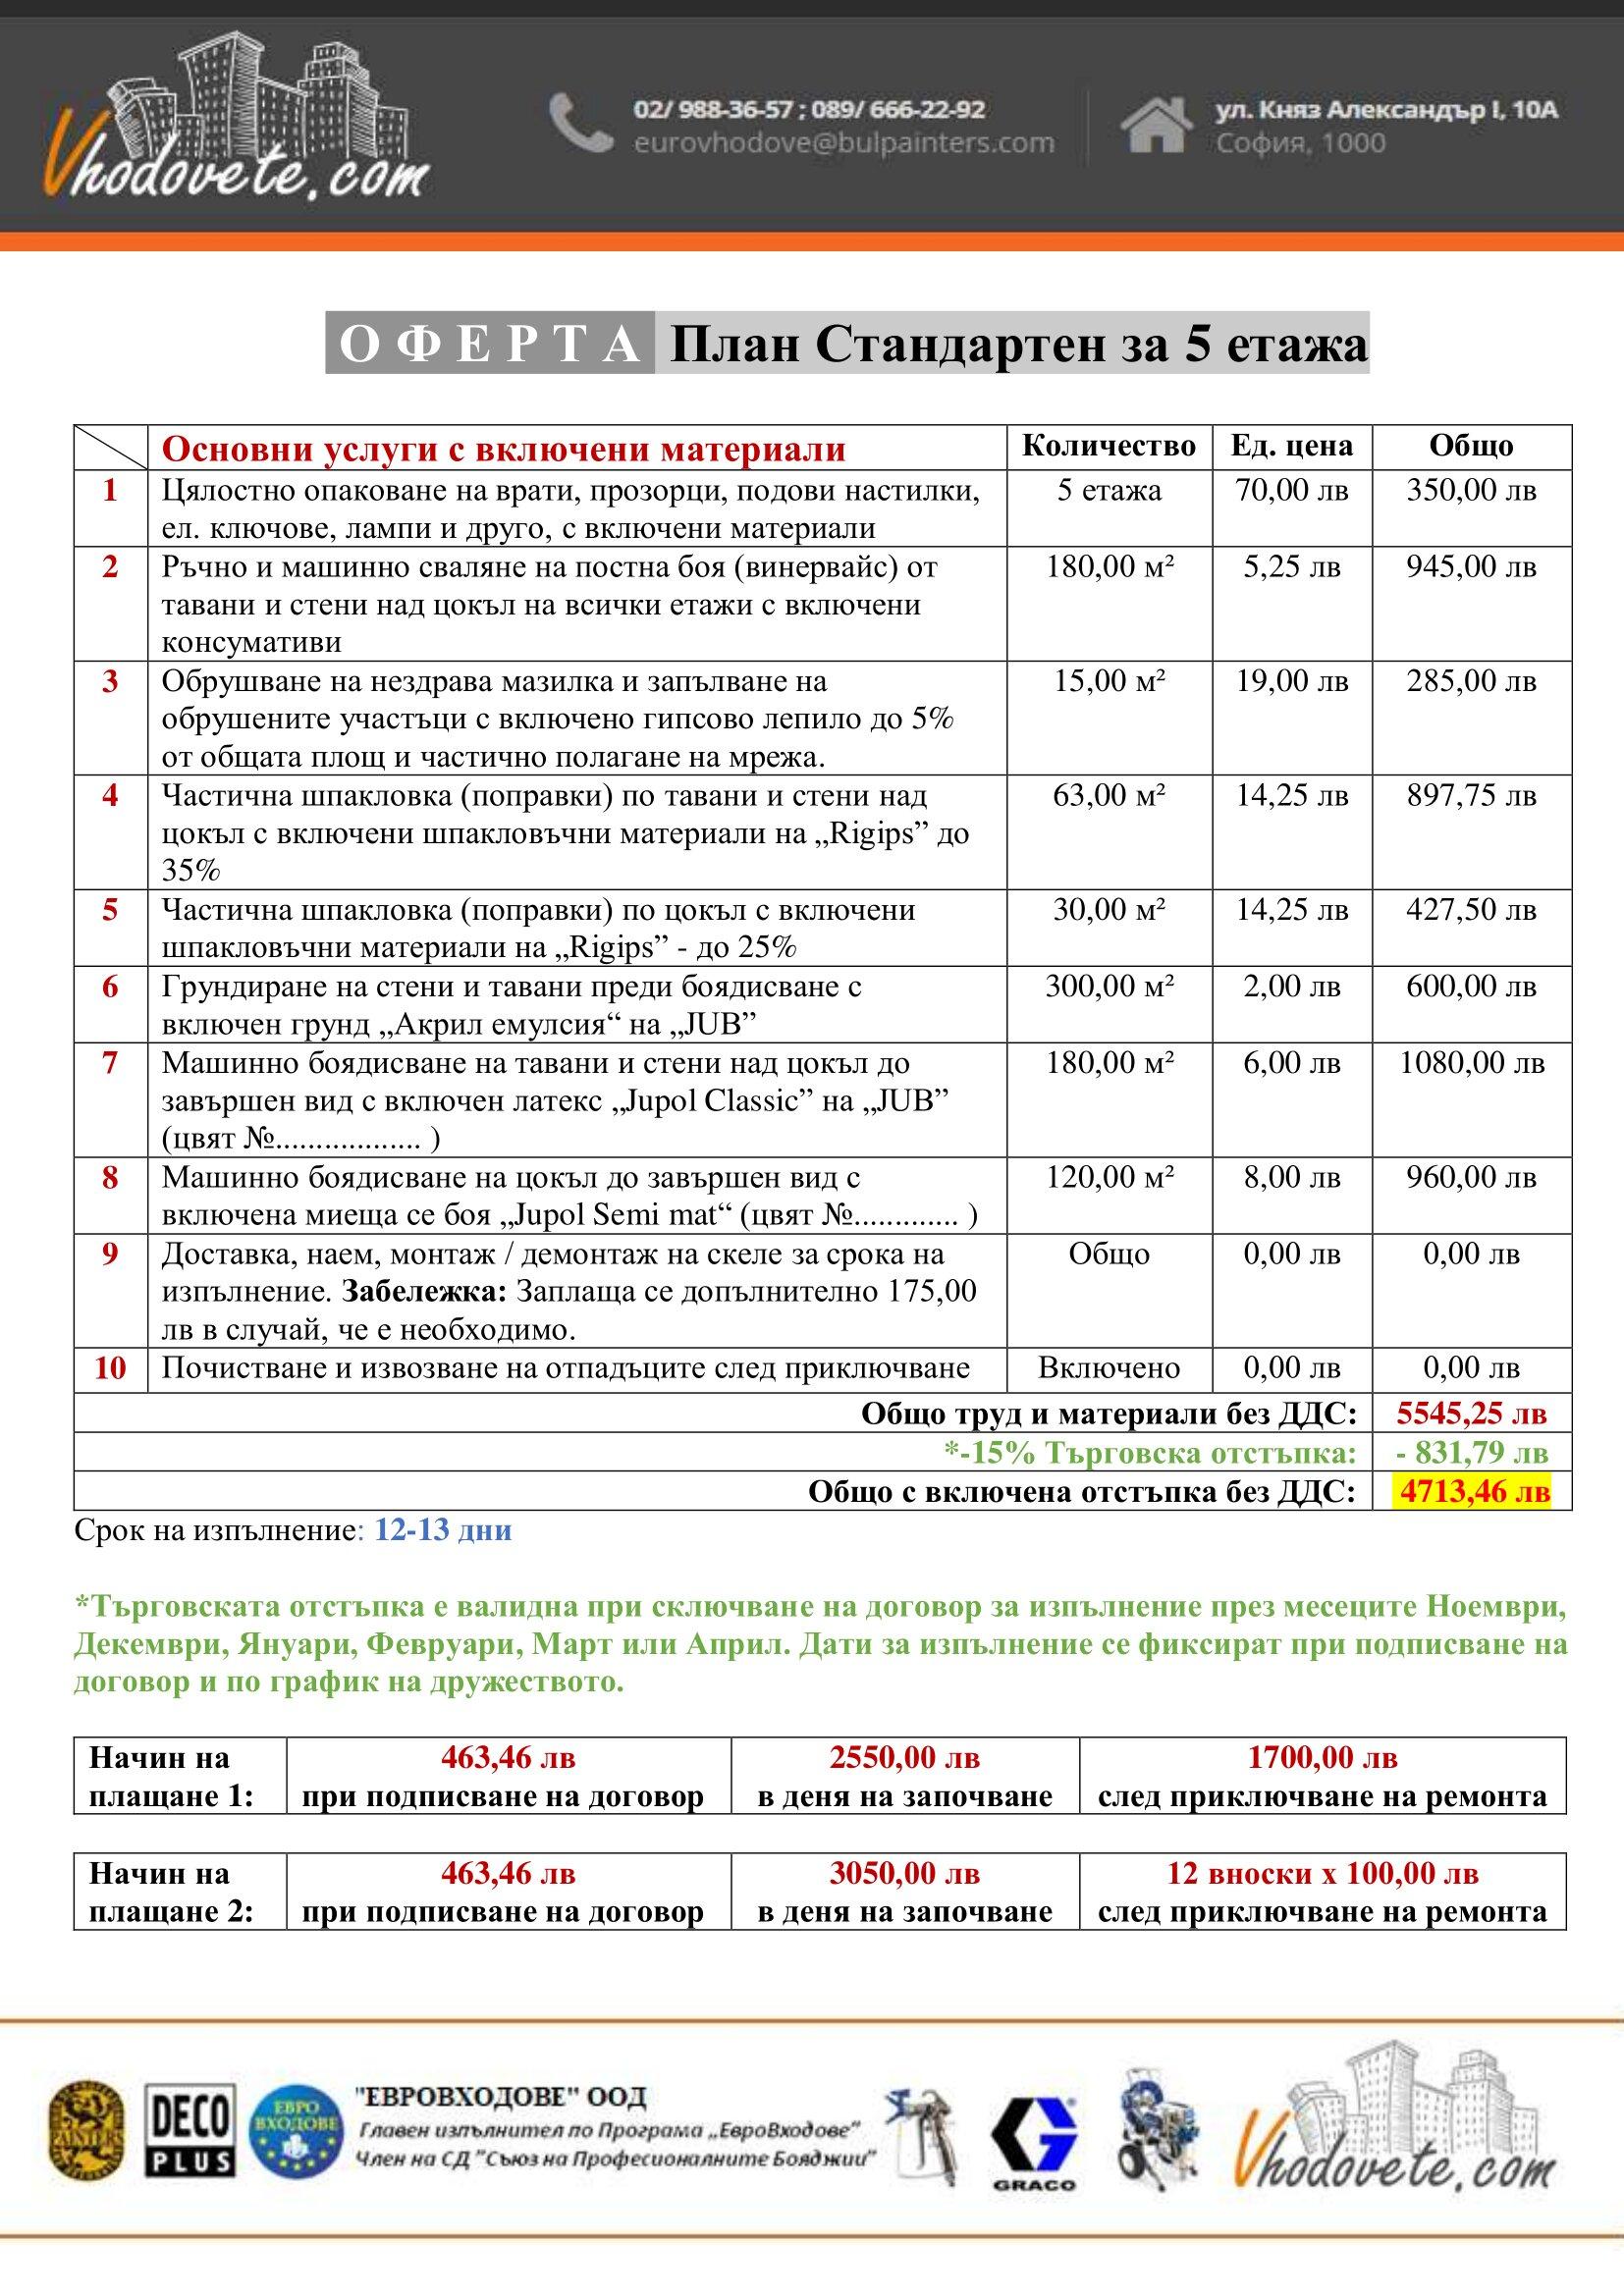 2-Oferta-za-5-et-Standarten-01102020